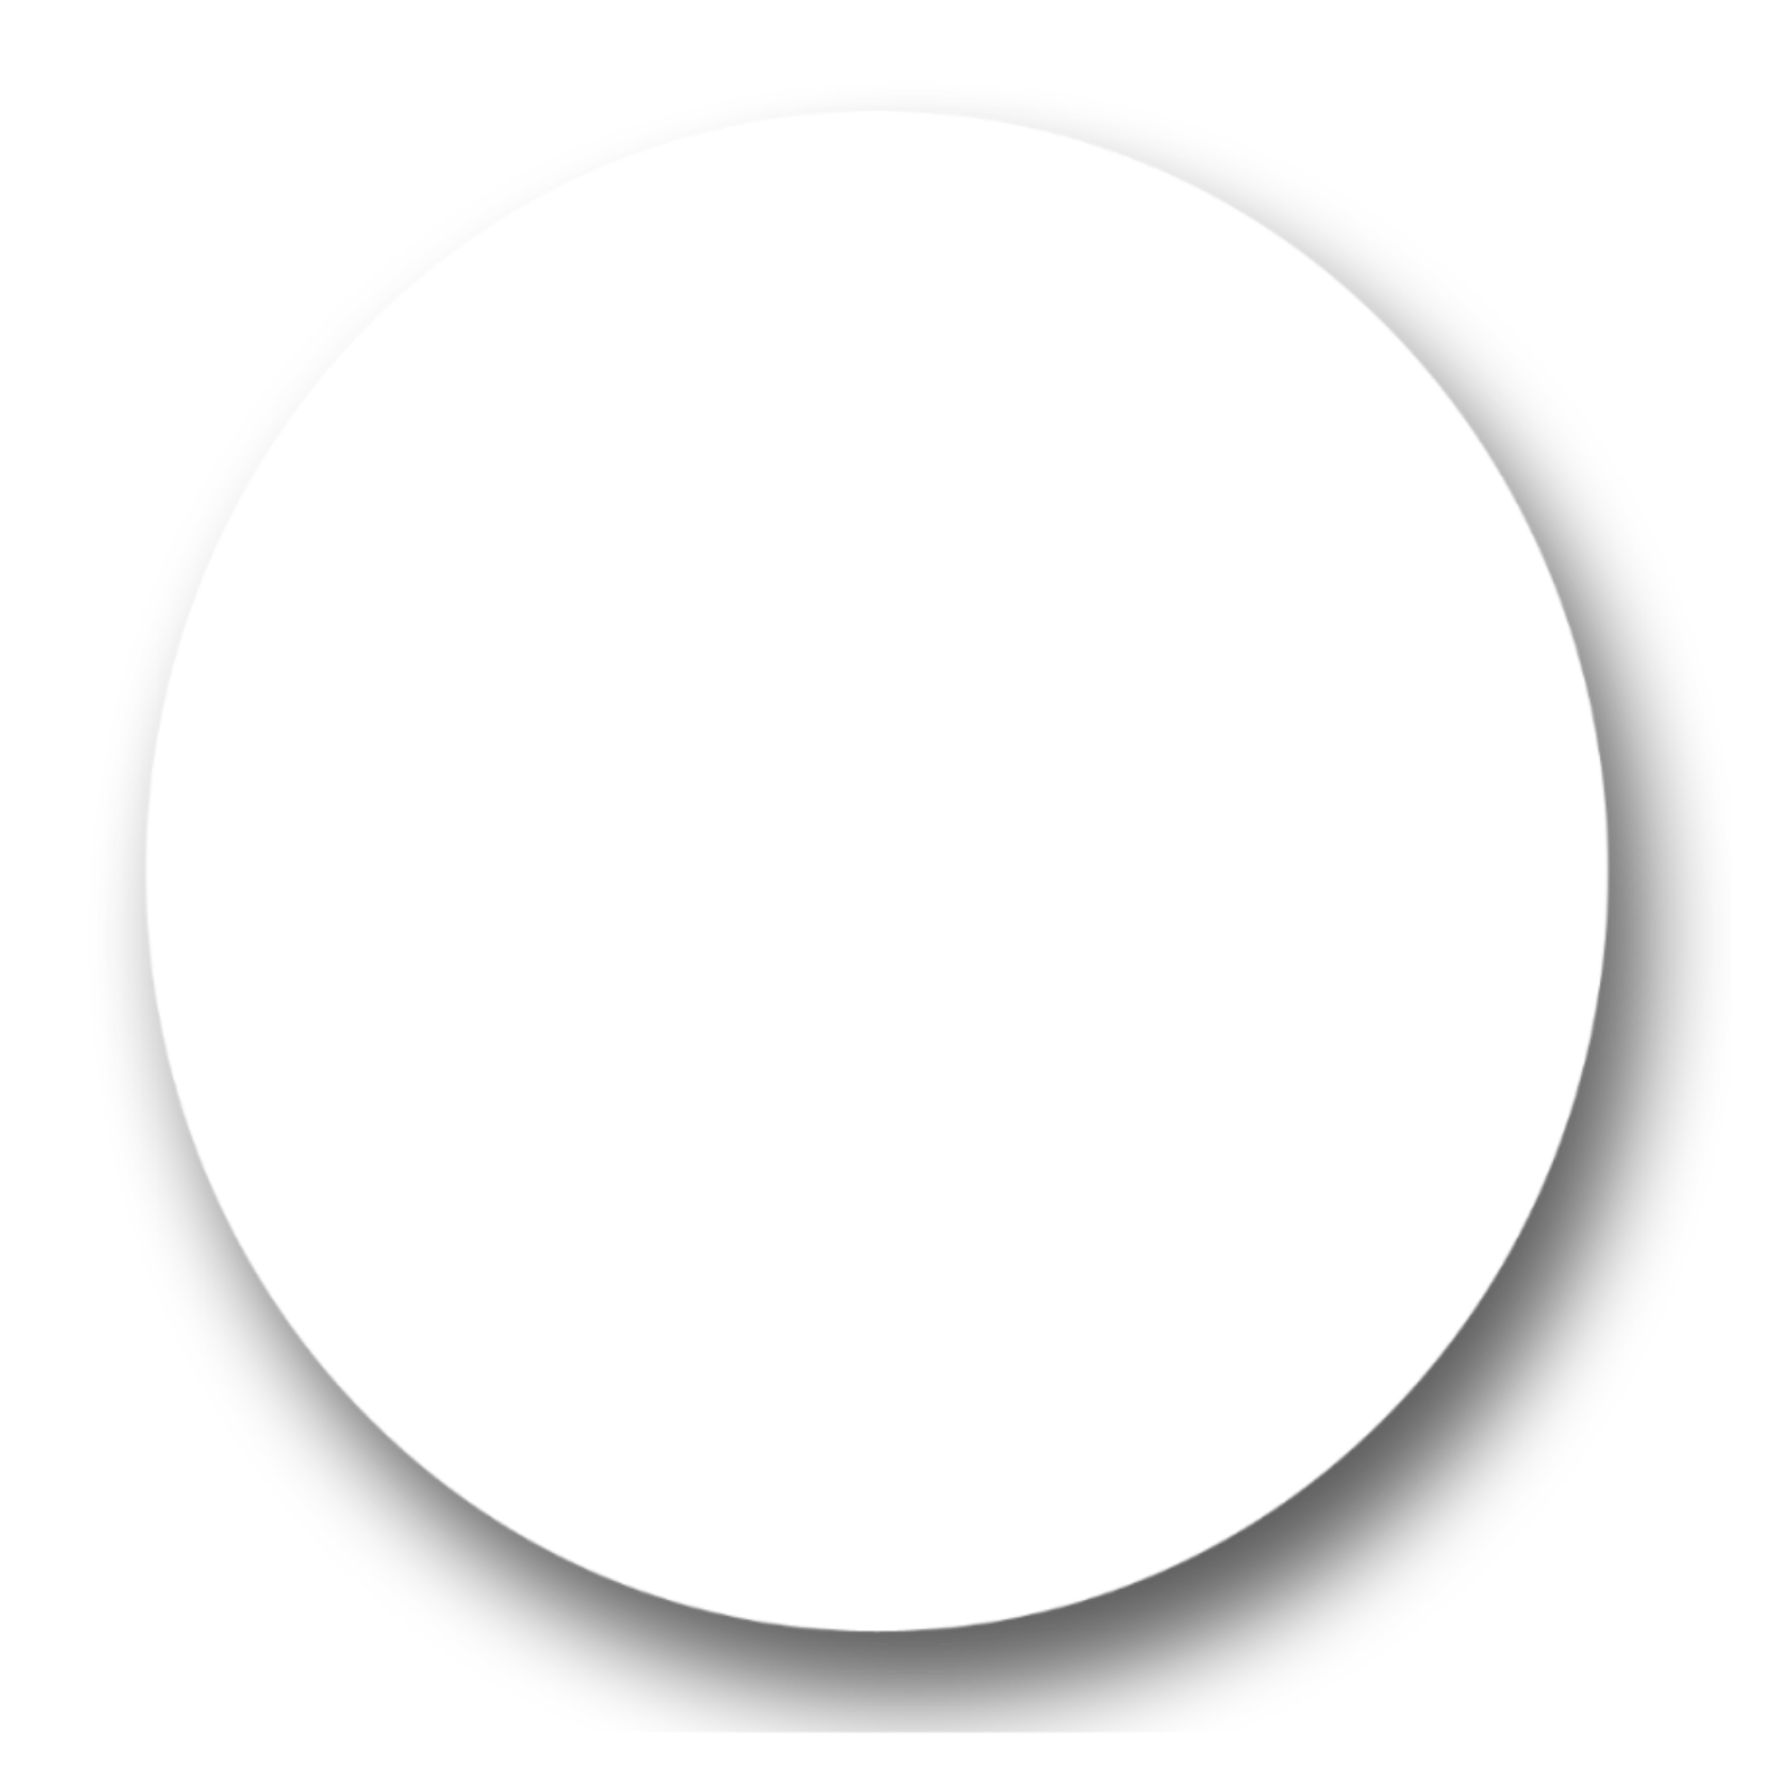 circle background overlay aesthetic icon overlay kpop...